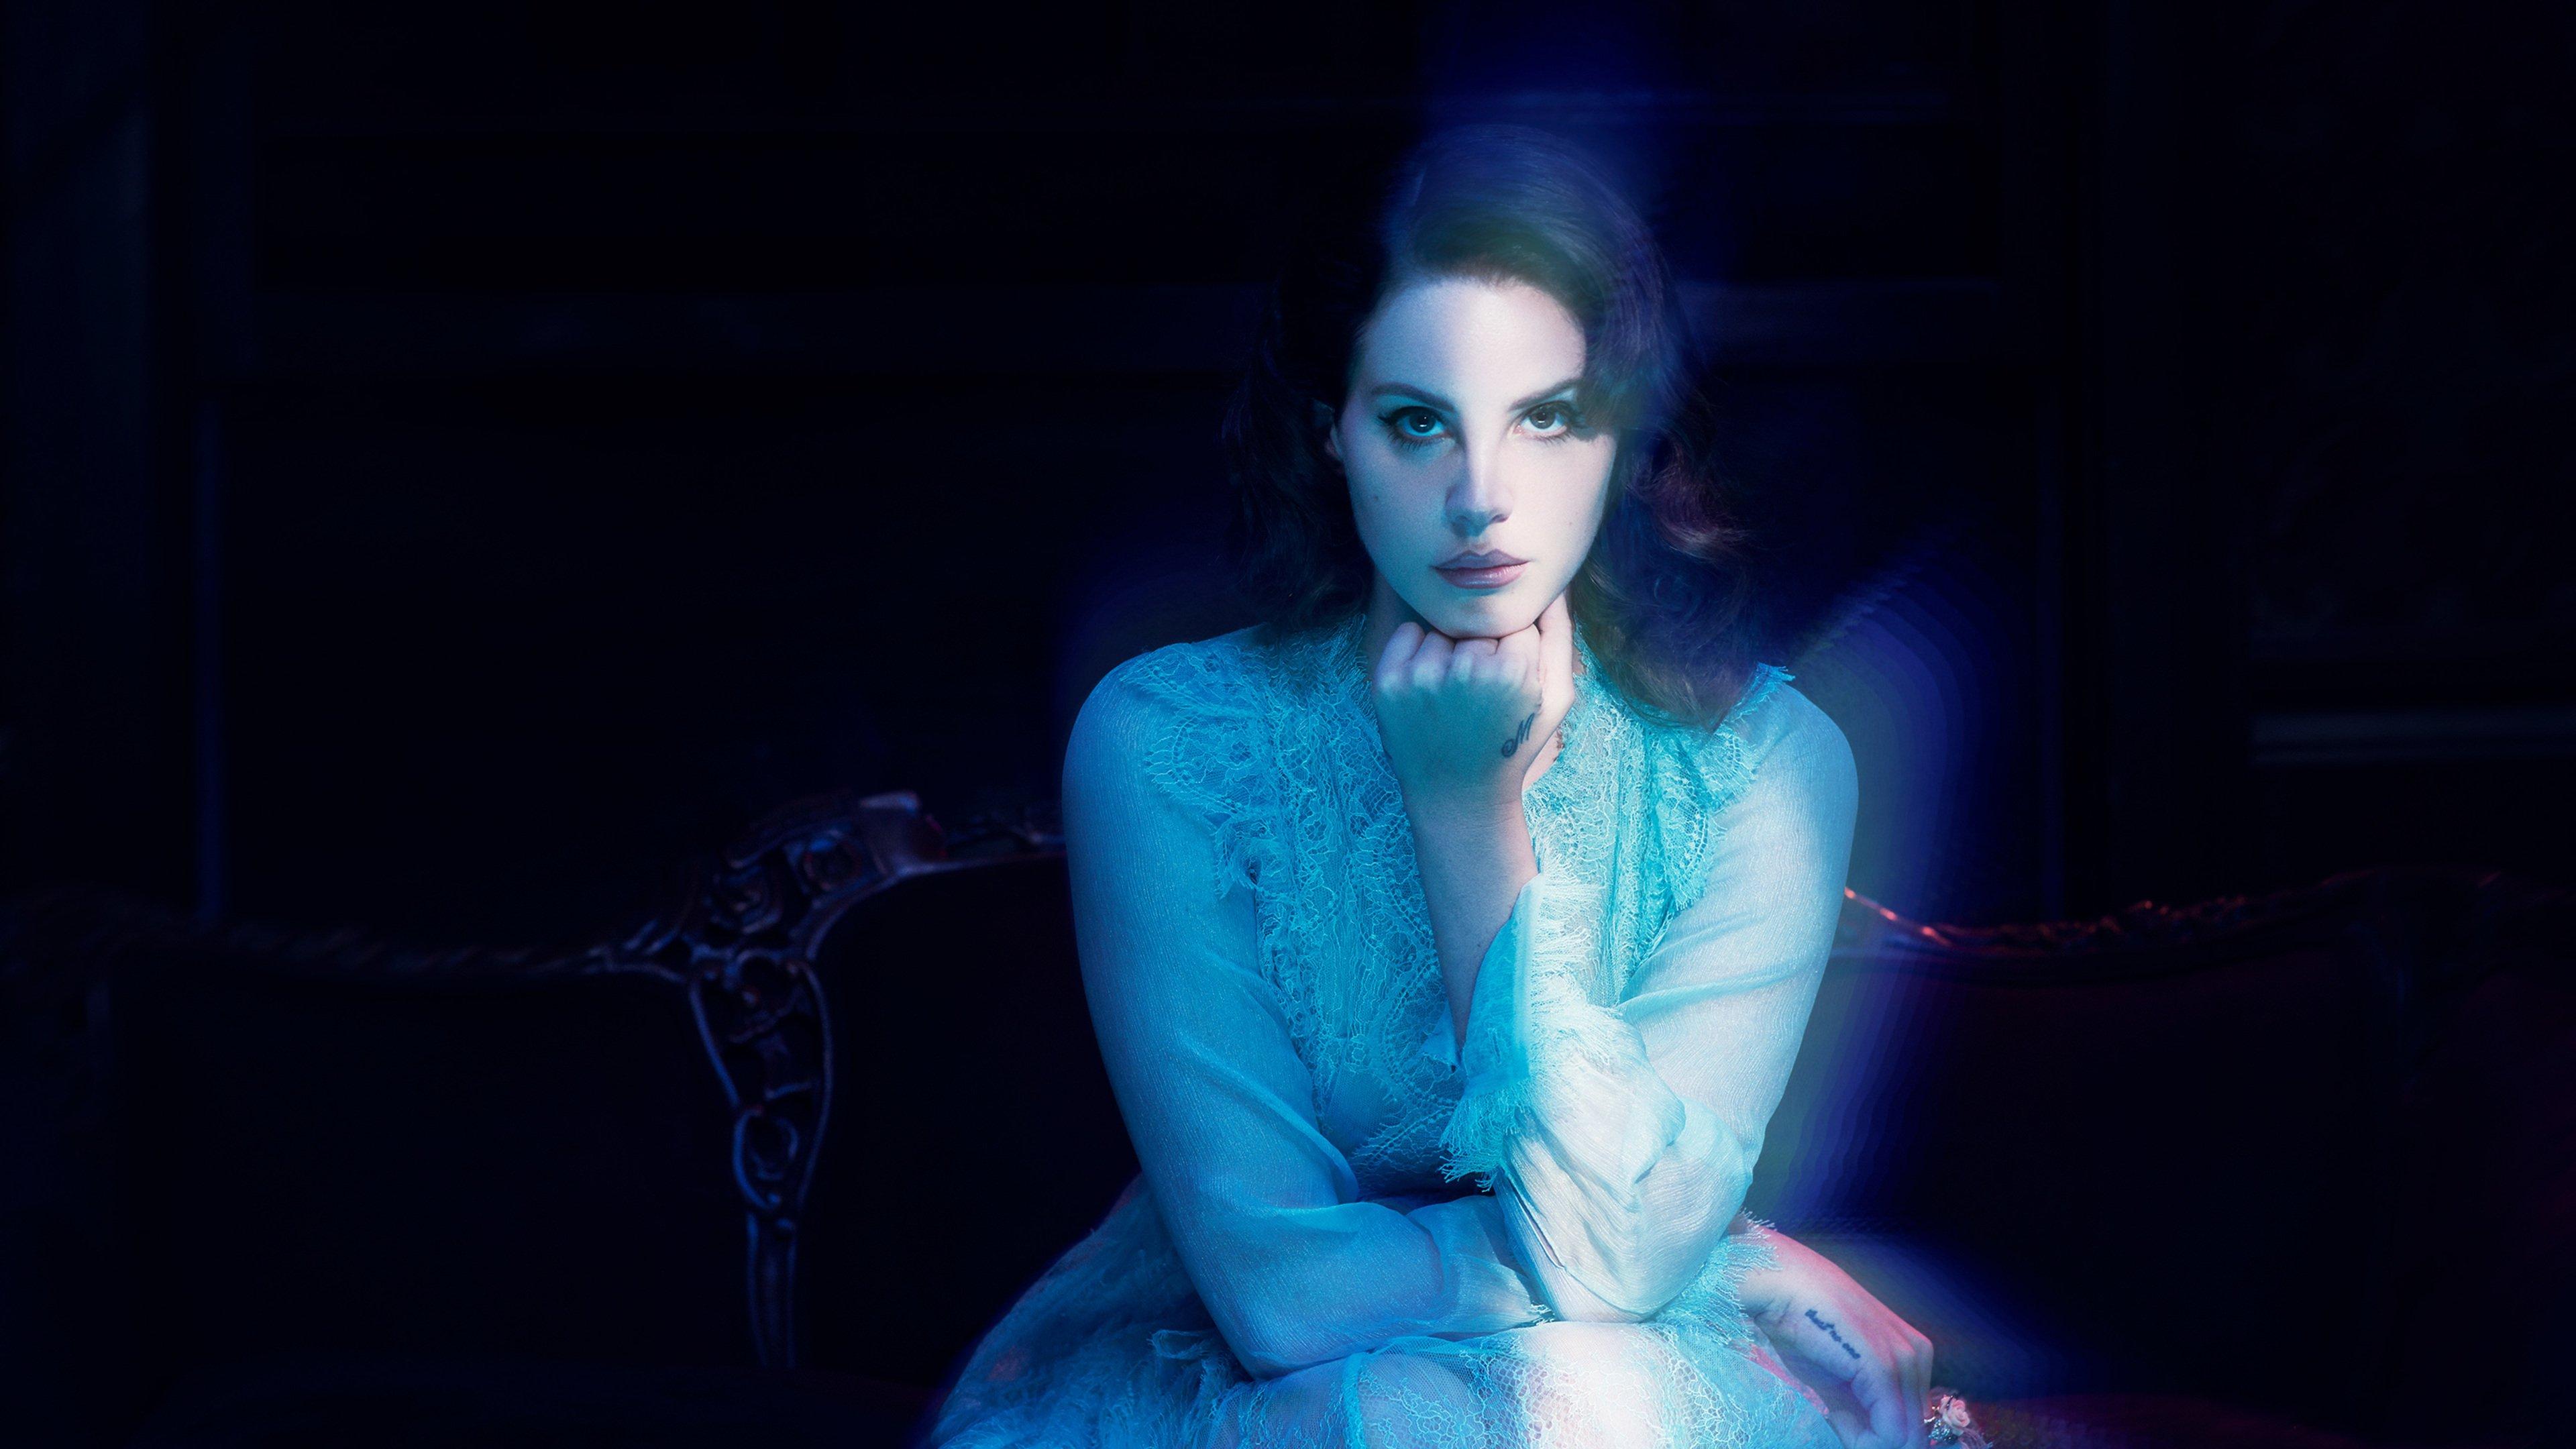 Lana Del Rey Complex Photoshoot Wallpaper 4k Ultra Hd Id3777